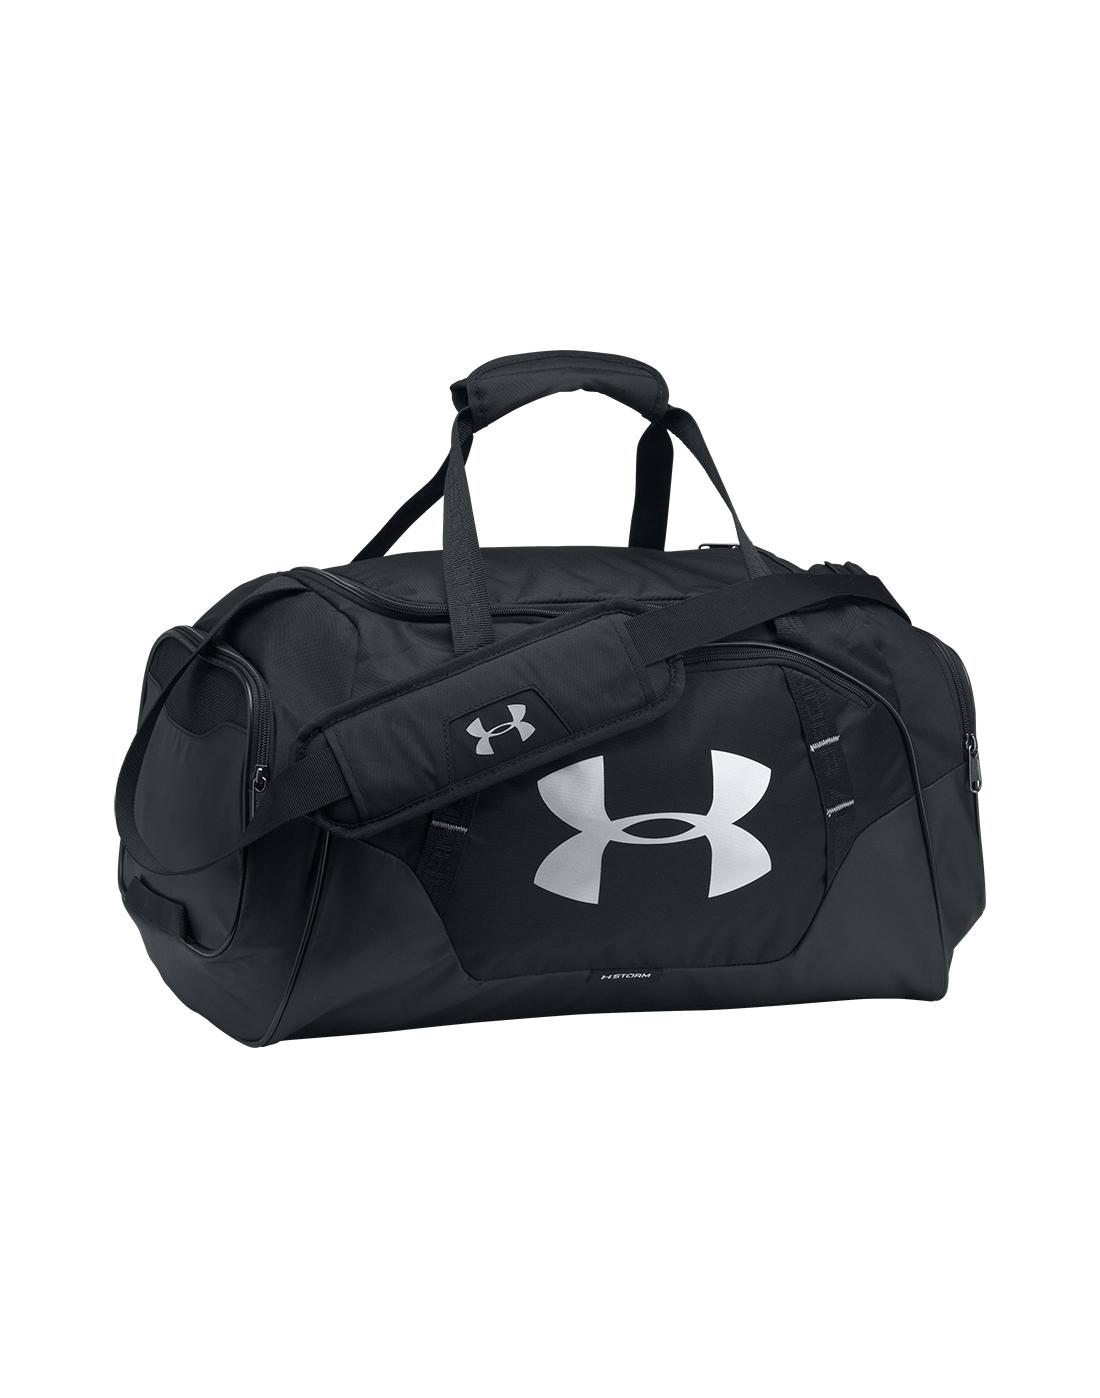 89c8a5adea Under Armour Undeniable Duffel Bag Small